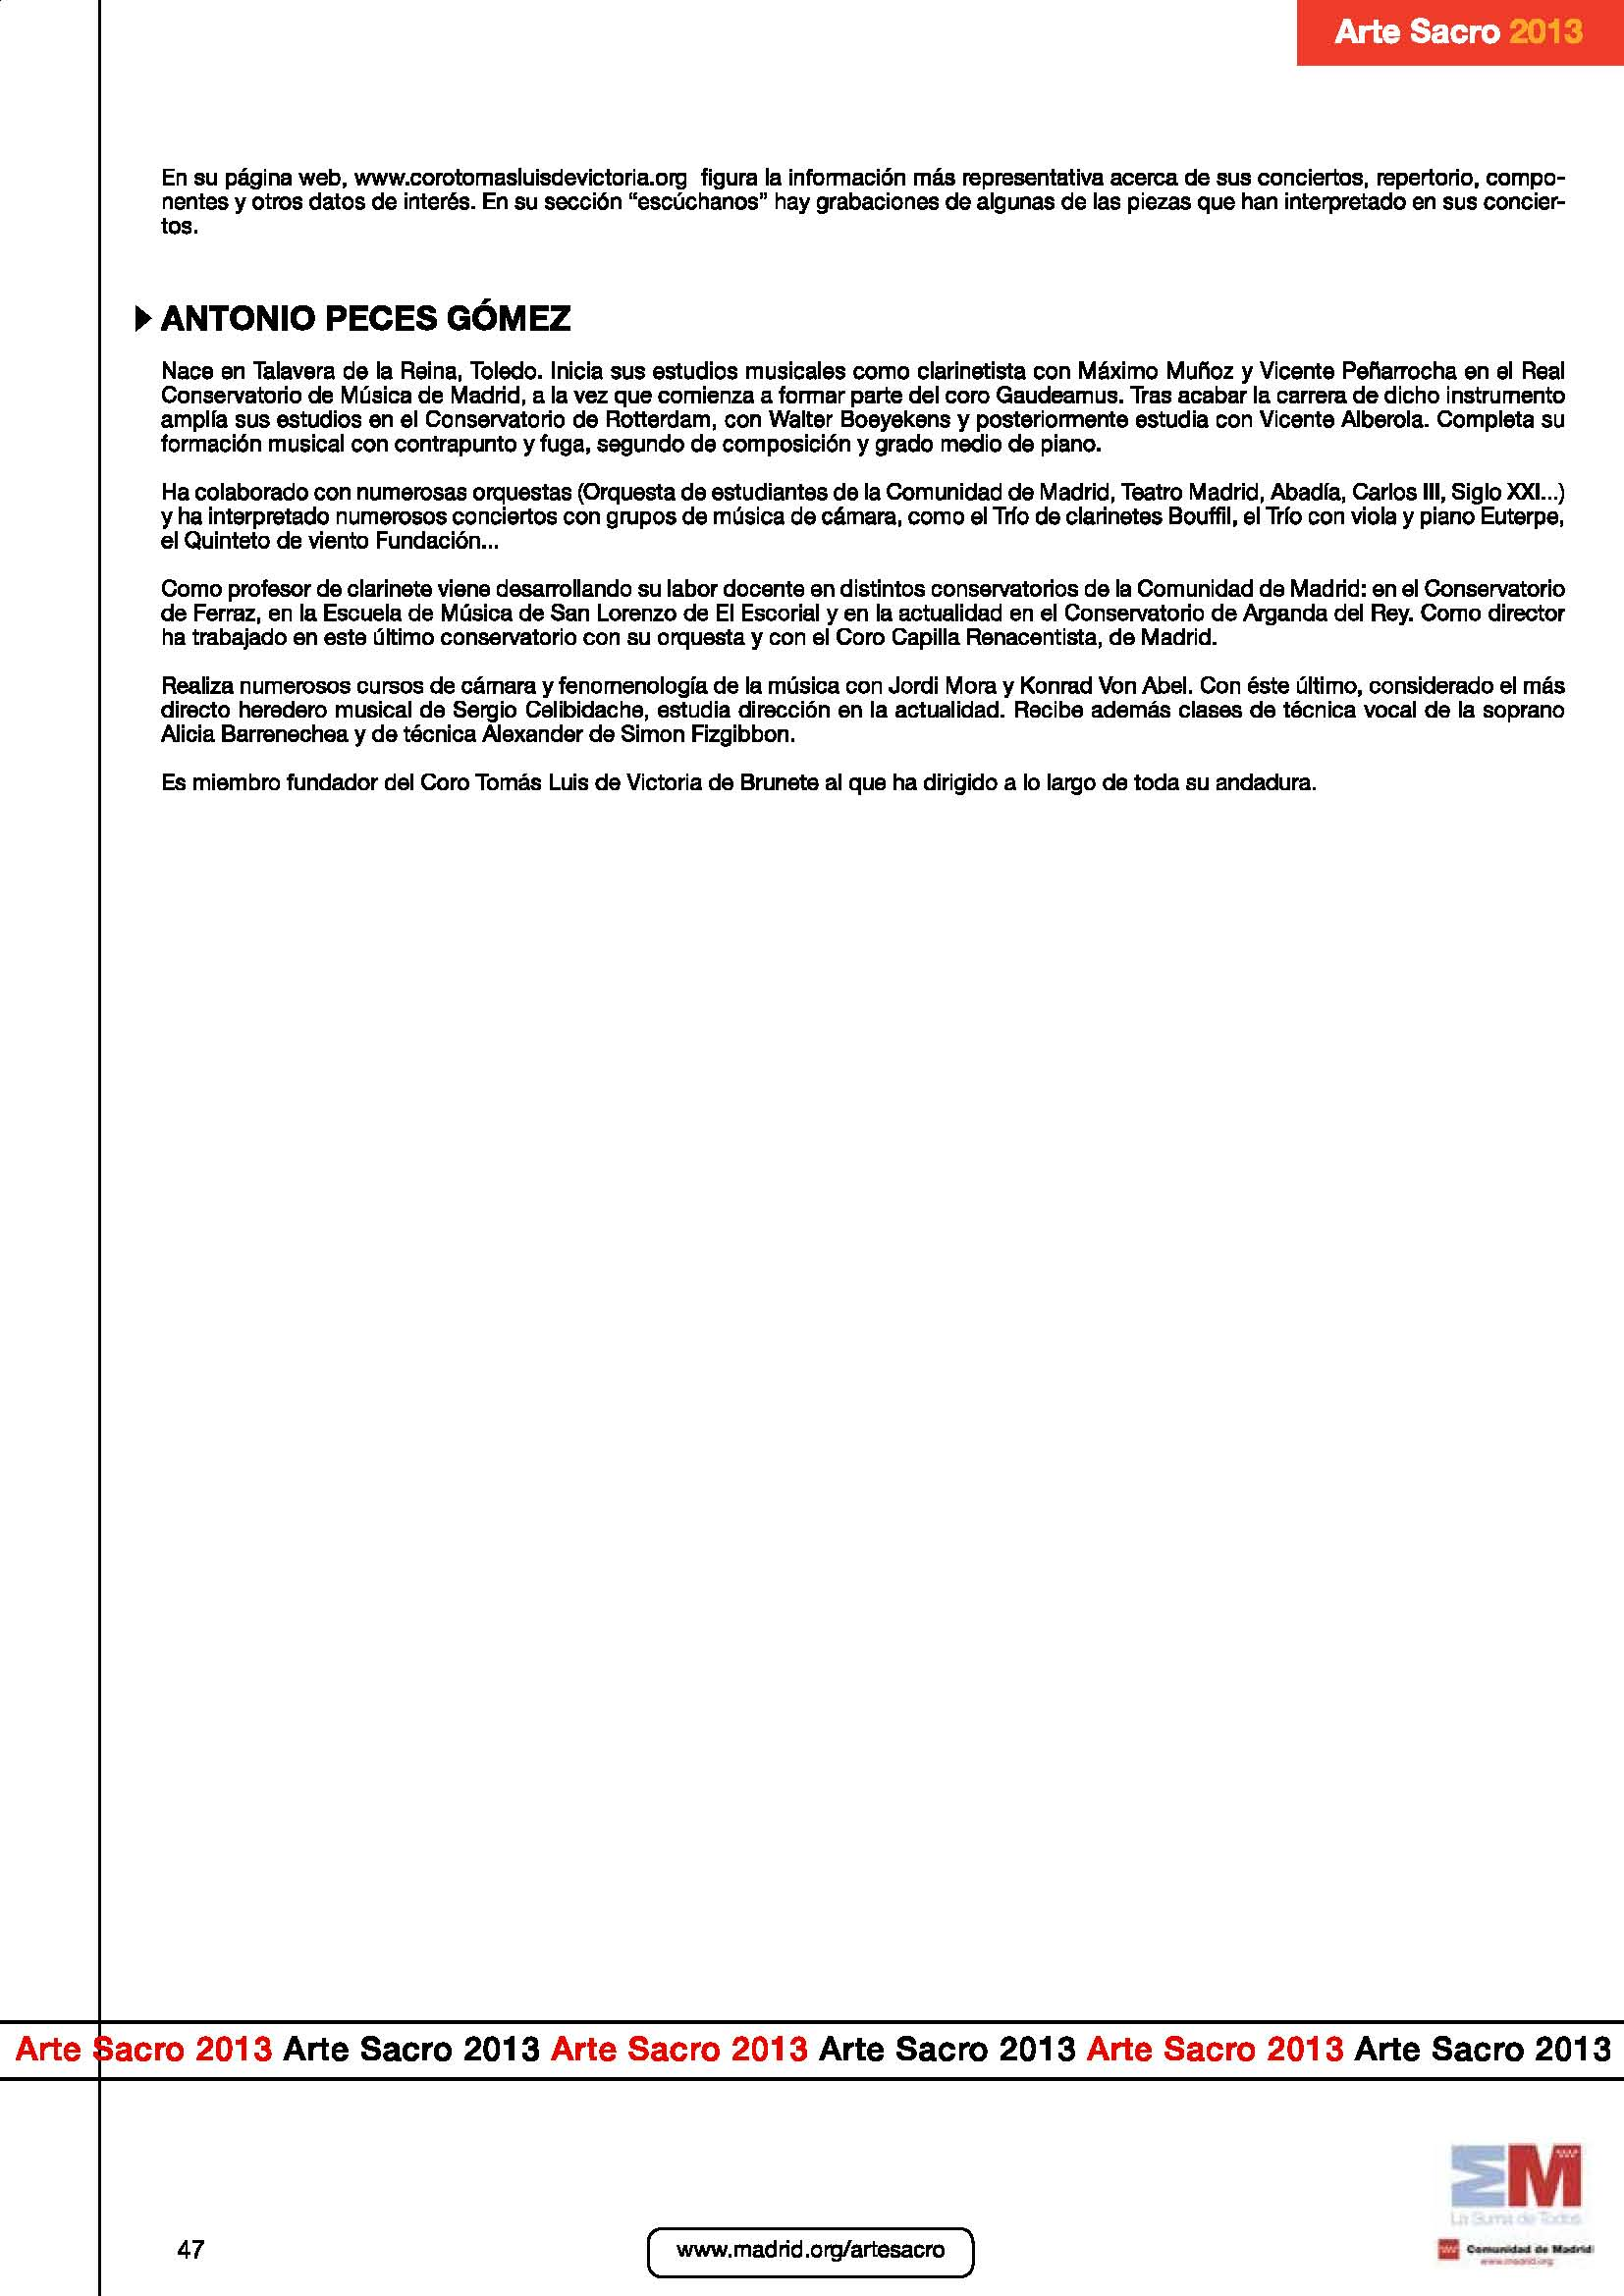 dossier_completo_Página_047